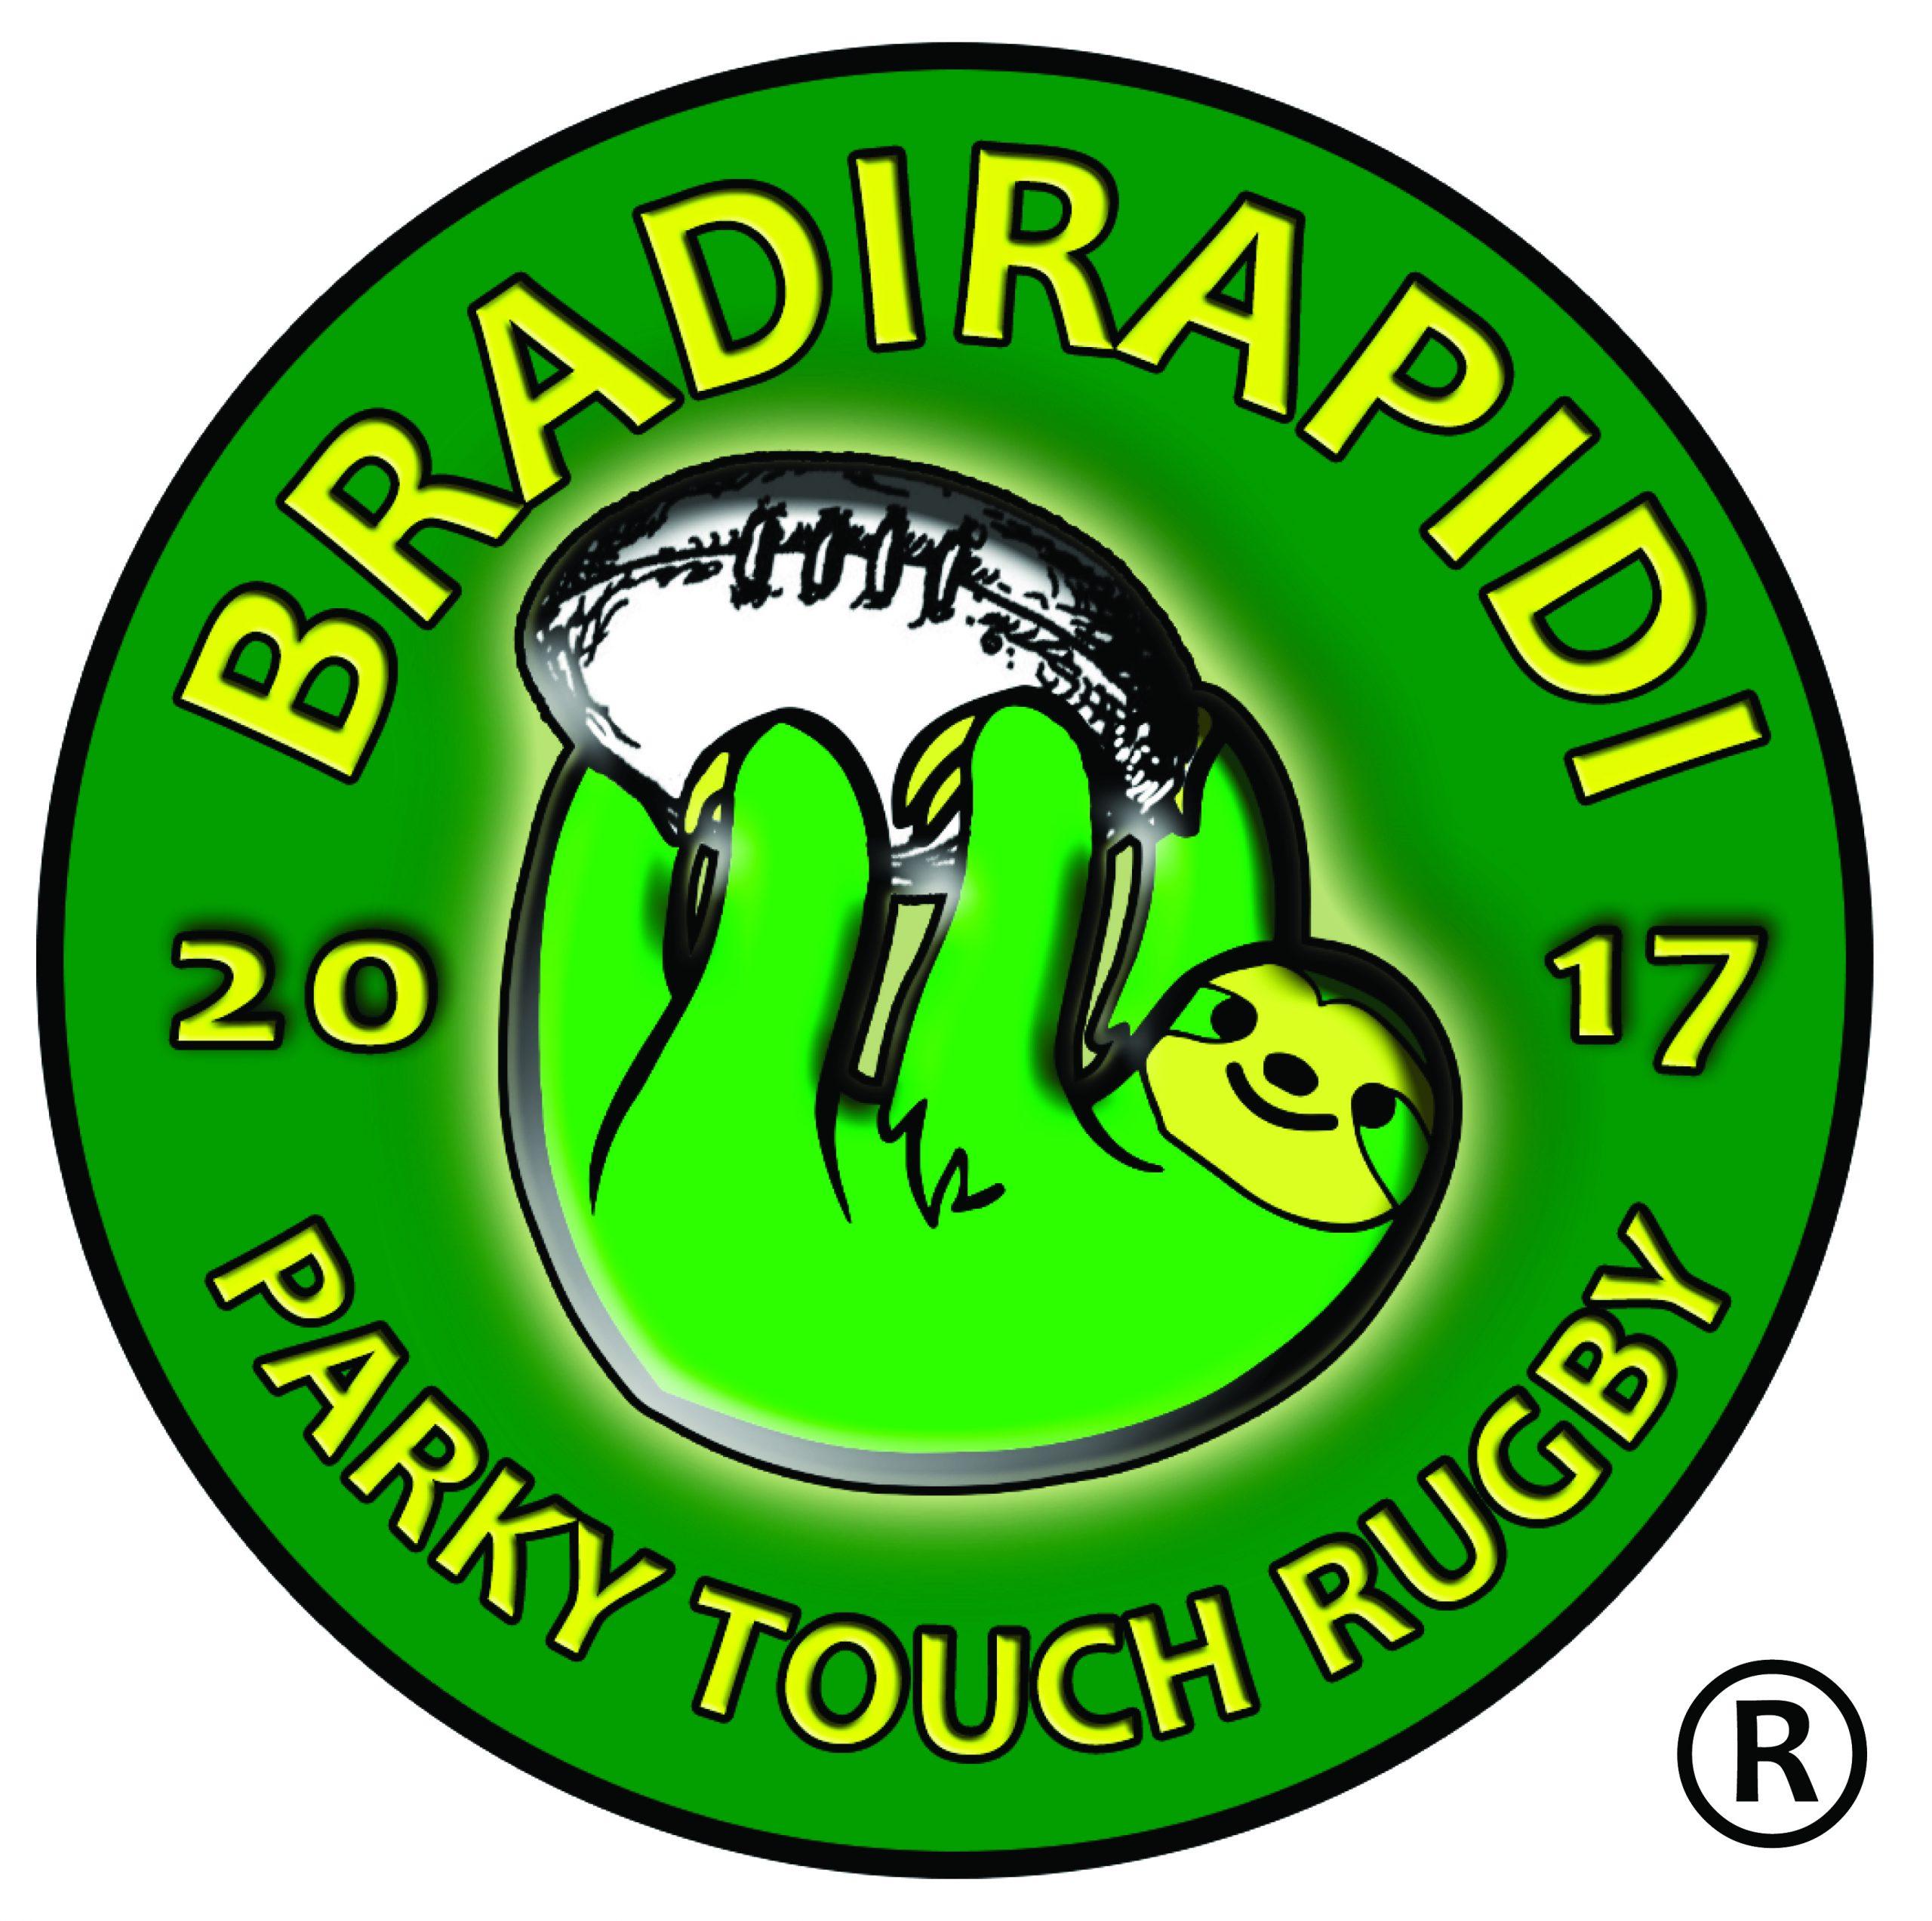 logo bradirapidi®